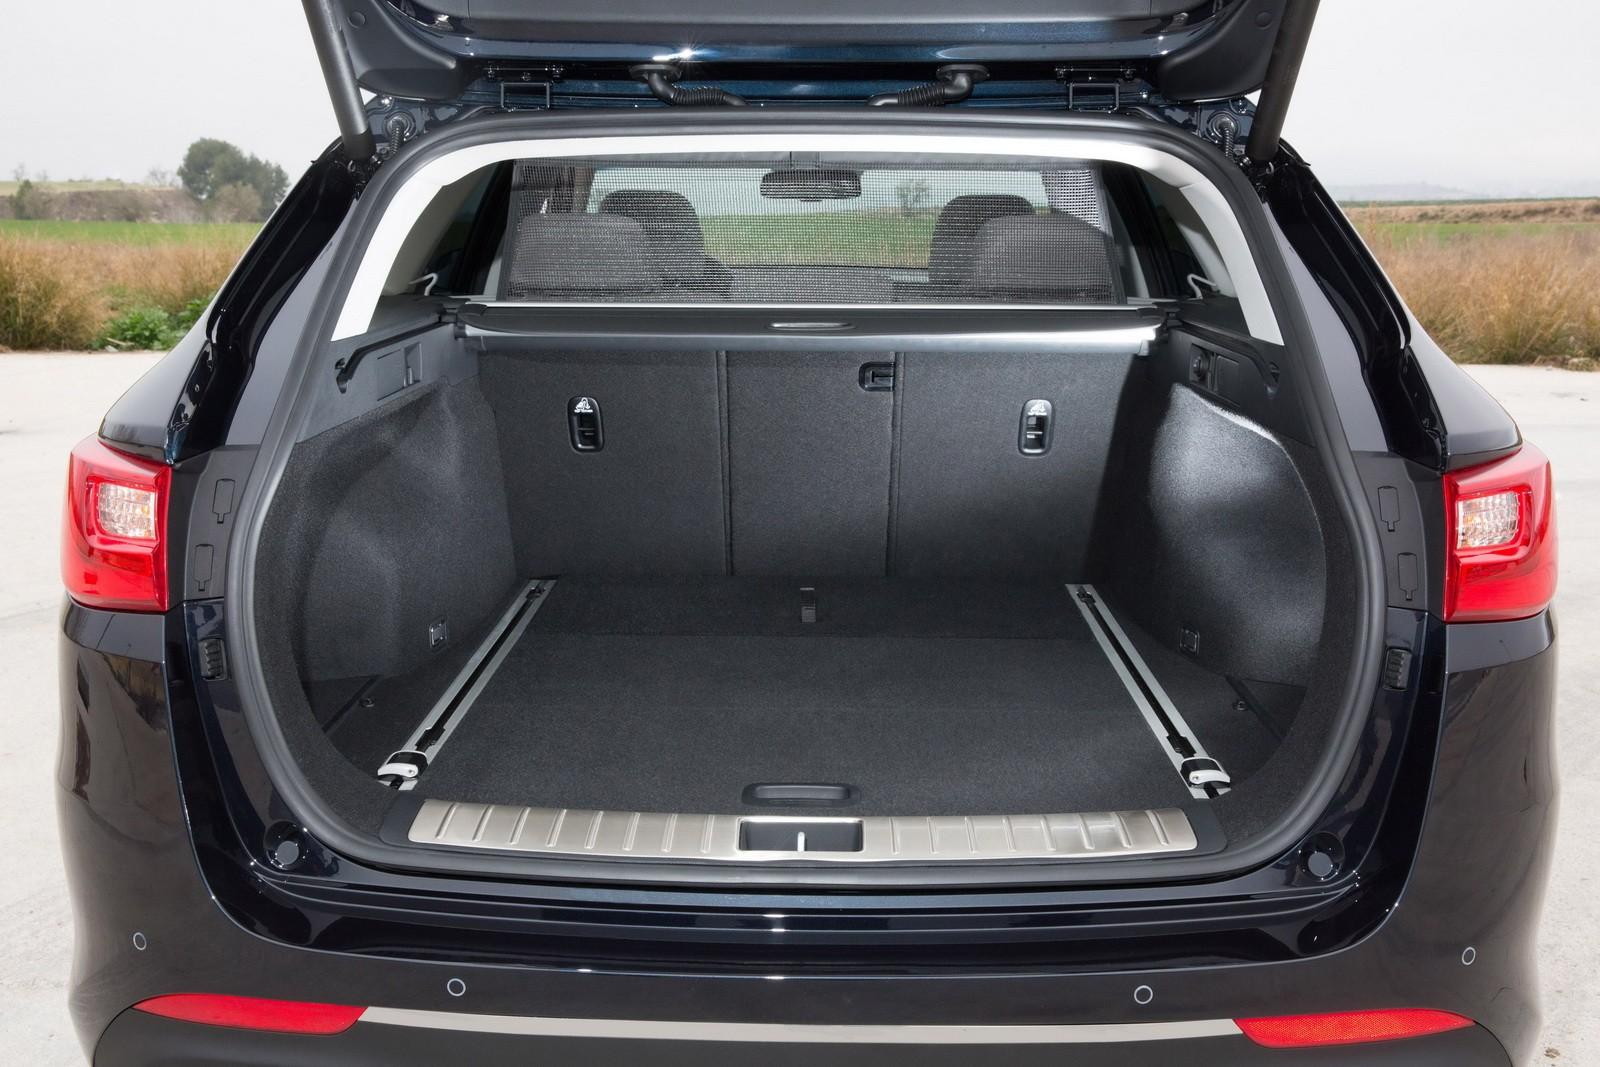 2016 kia optima sportswagon debuts with 245 hp turbo 2 0. Black Bedroom Furniture Sets. Home Design Ideas